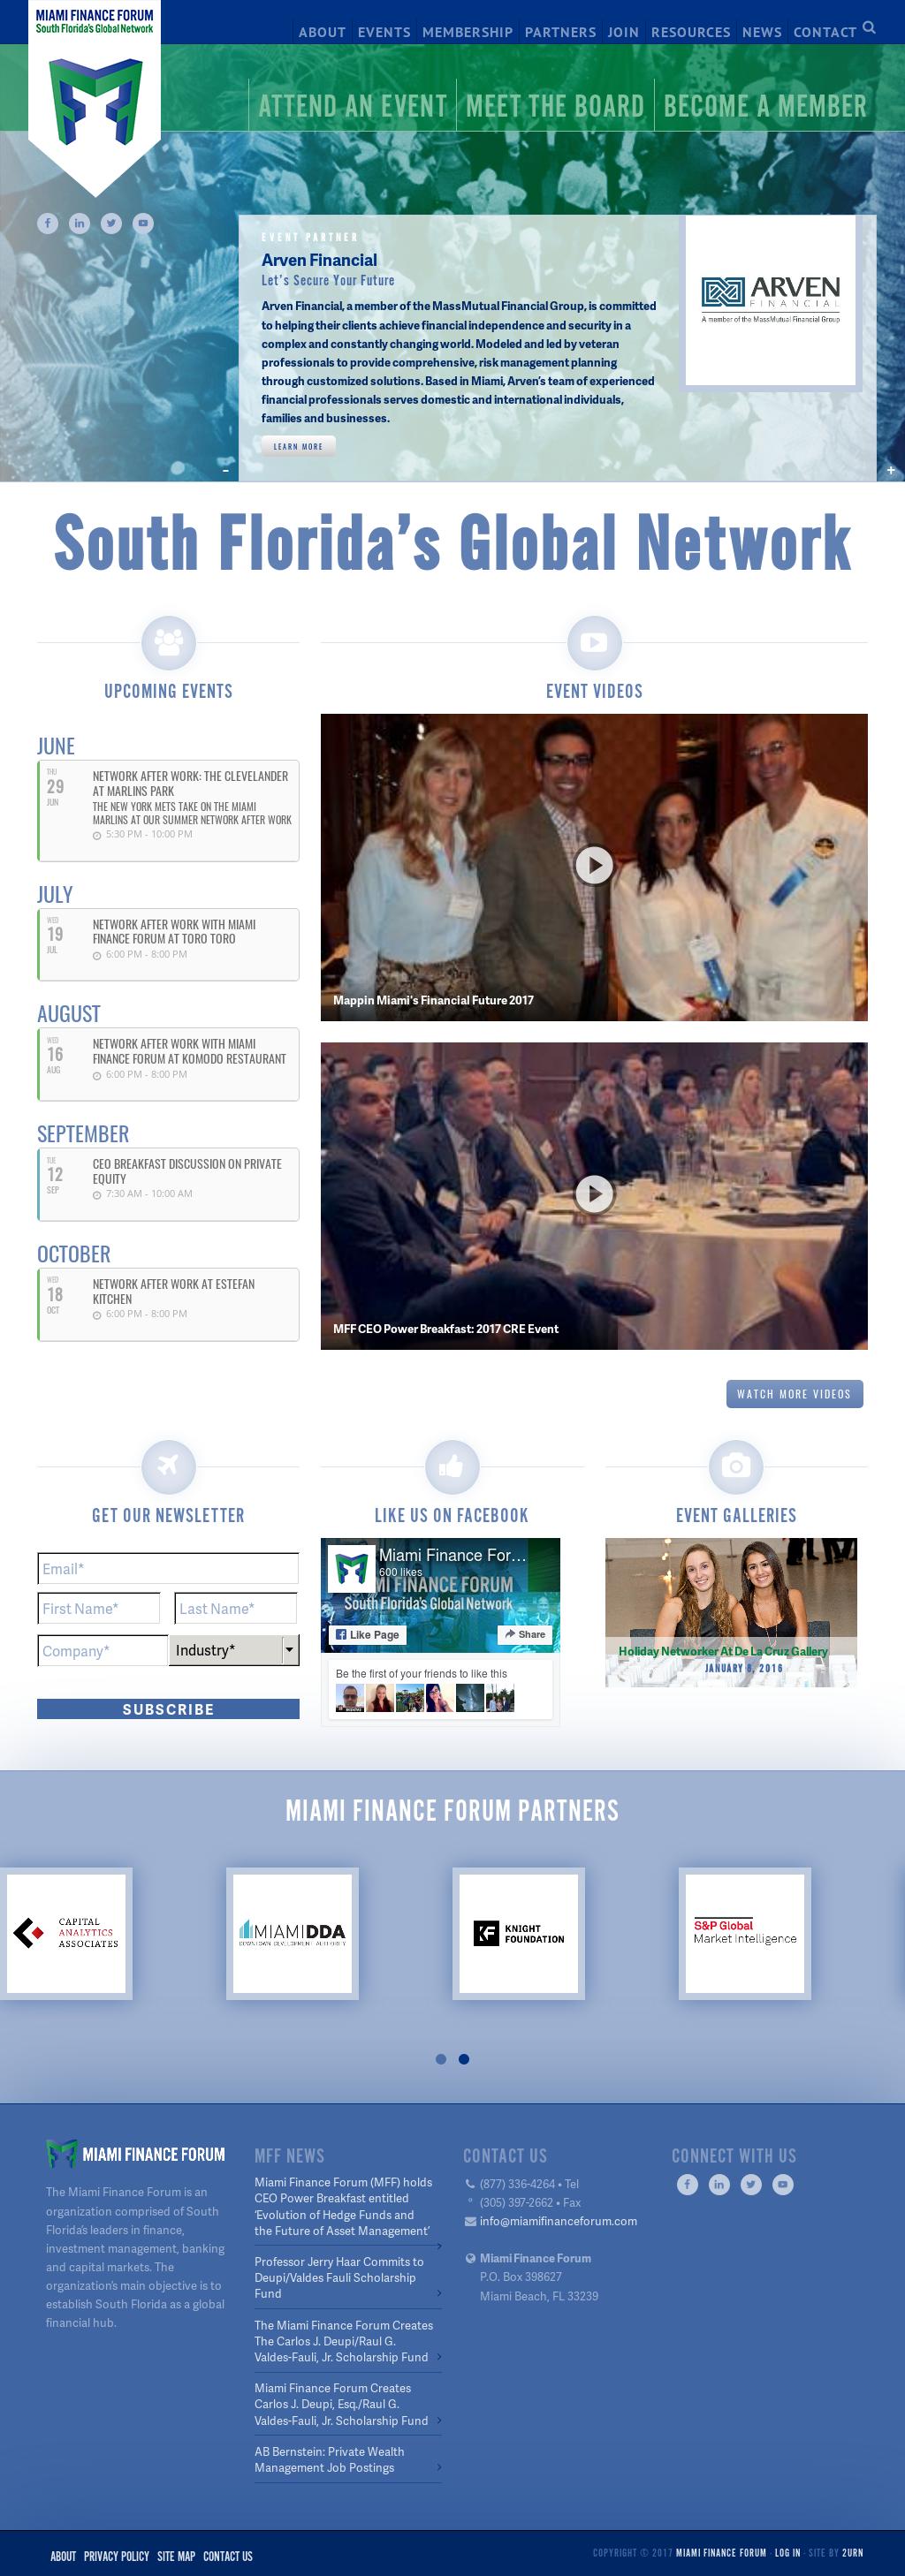 Miami Finance Forum Competitors, Revenue and Employees